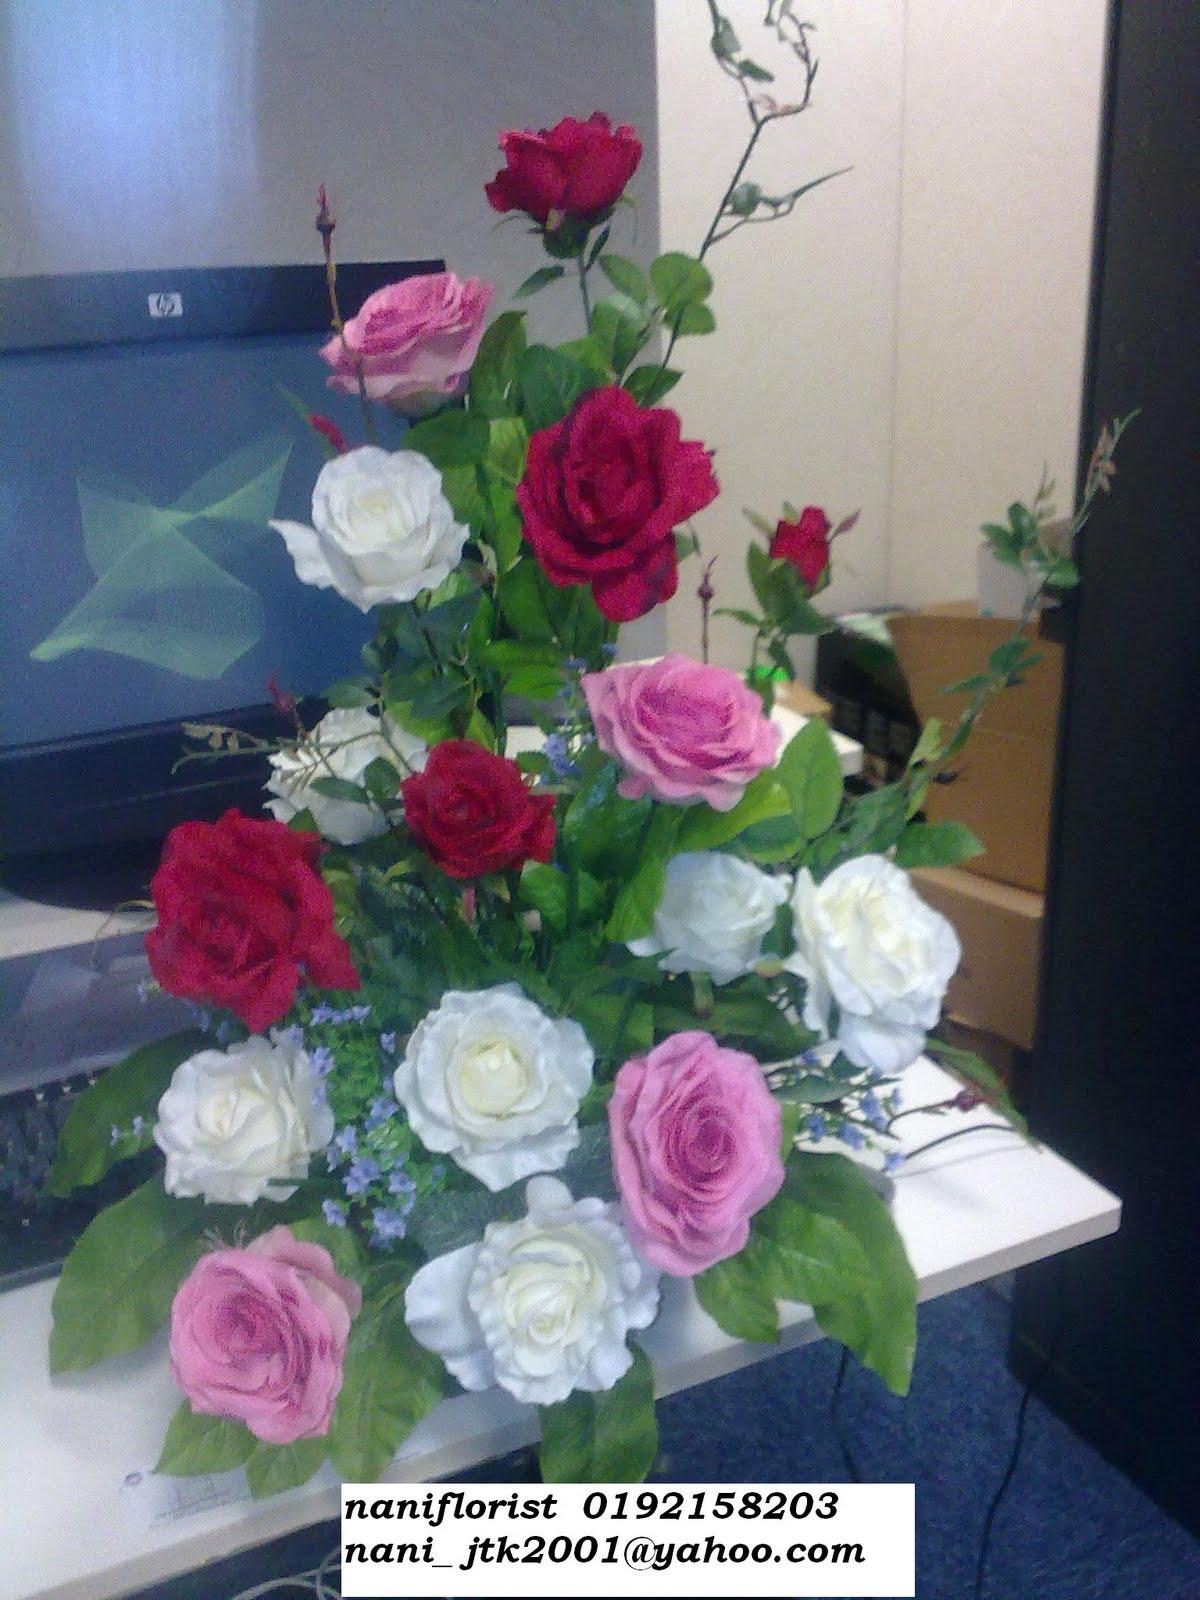 Nani Florist Jambangan Bunga Bunga Artifical Menghiasi Di